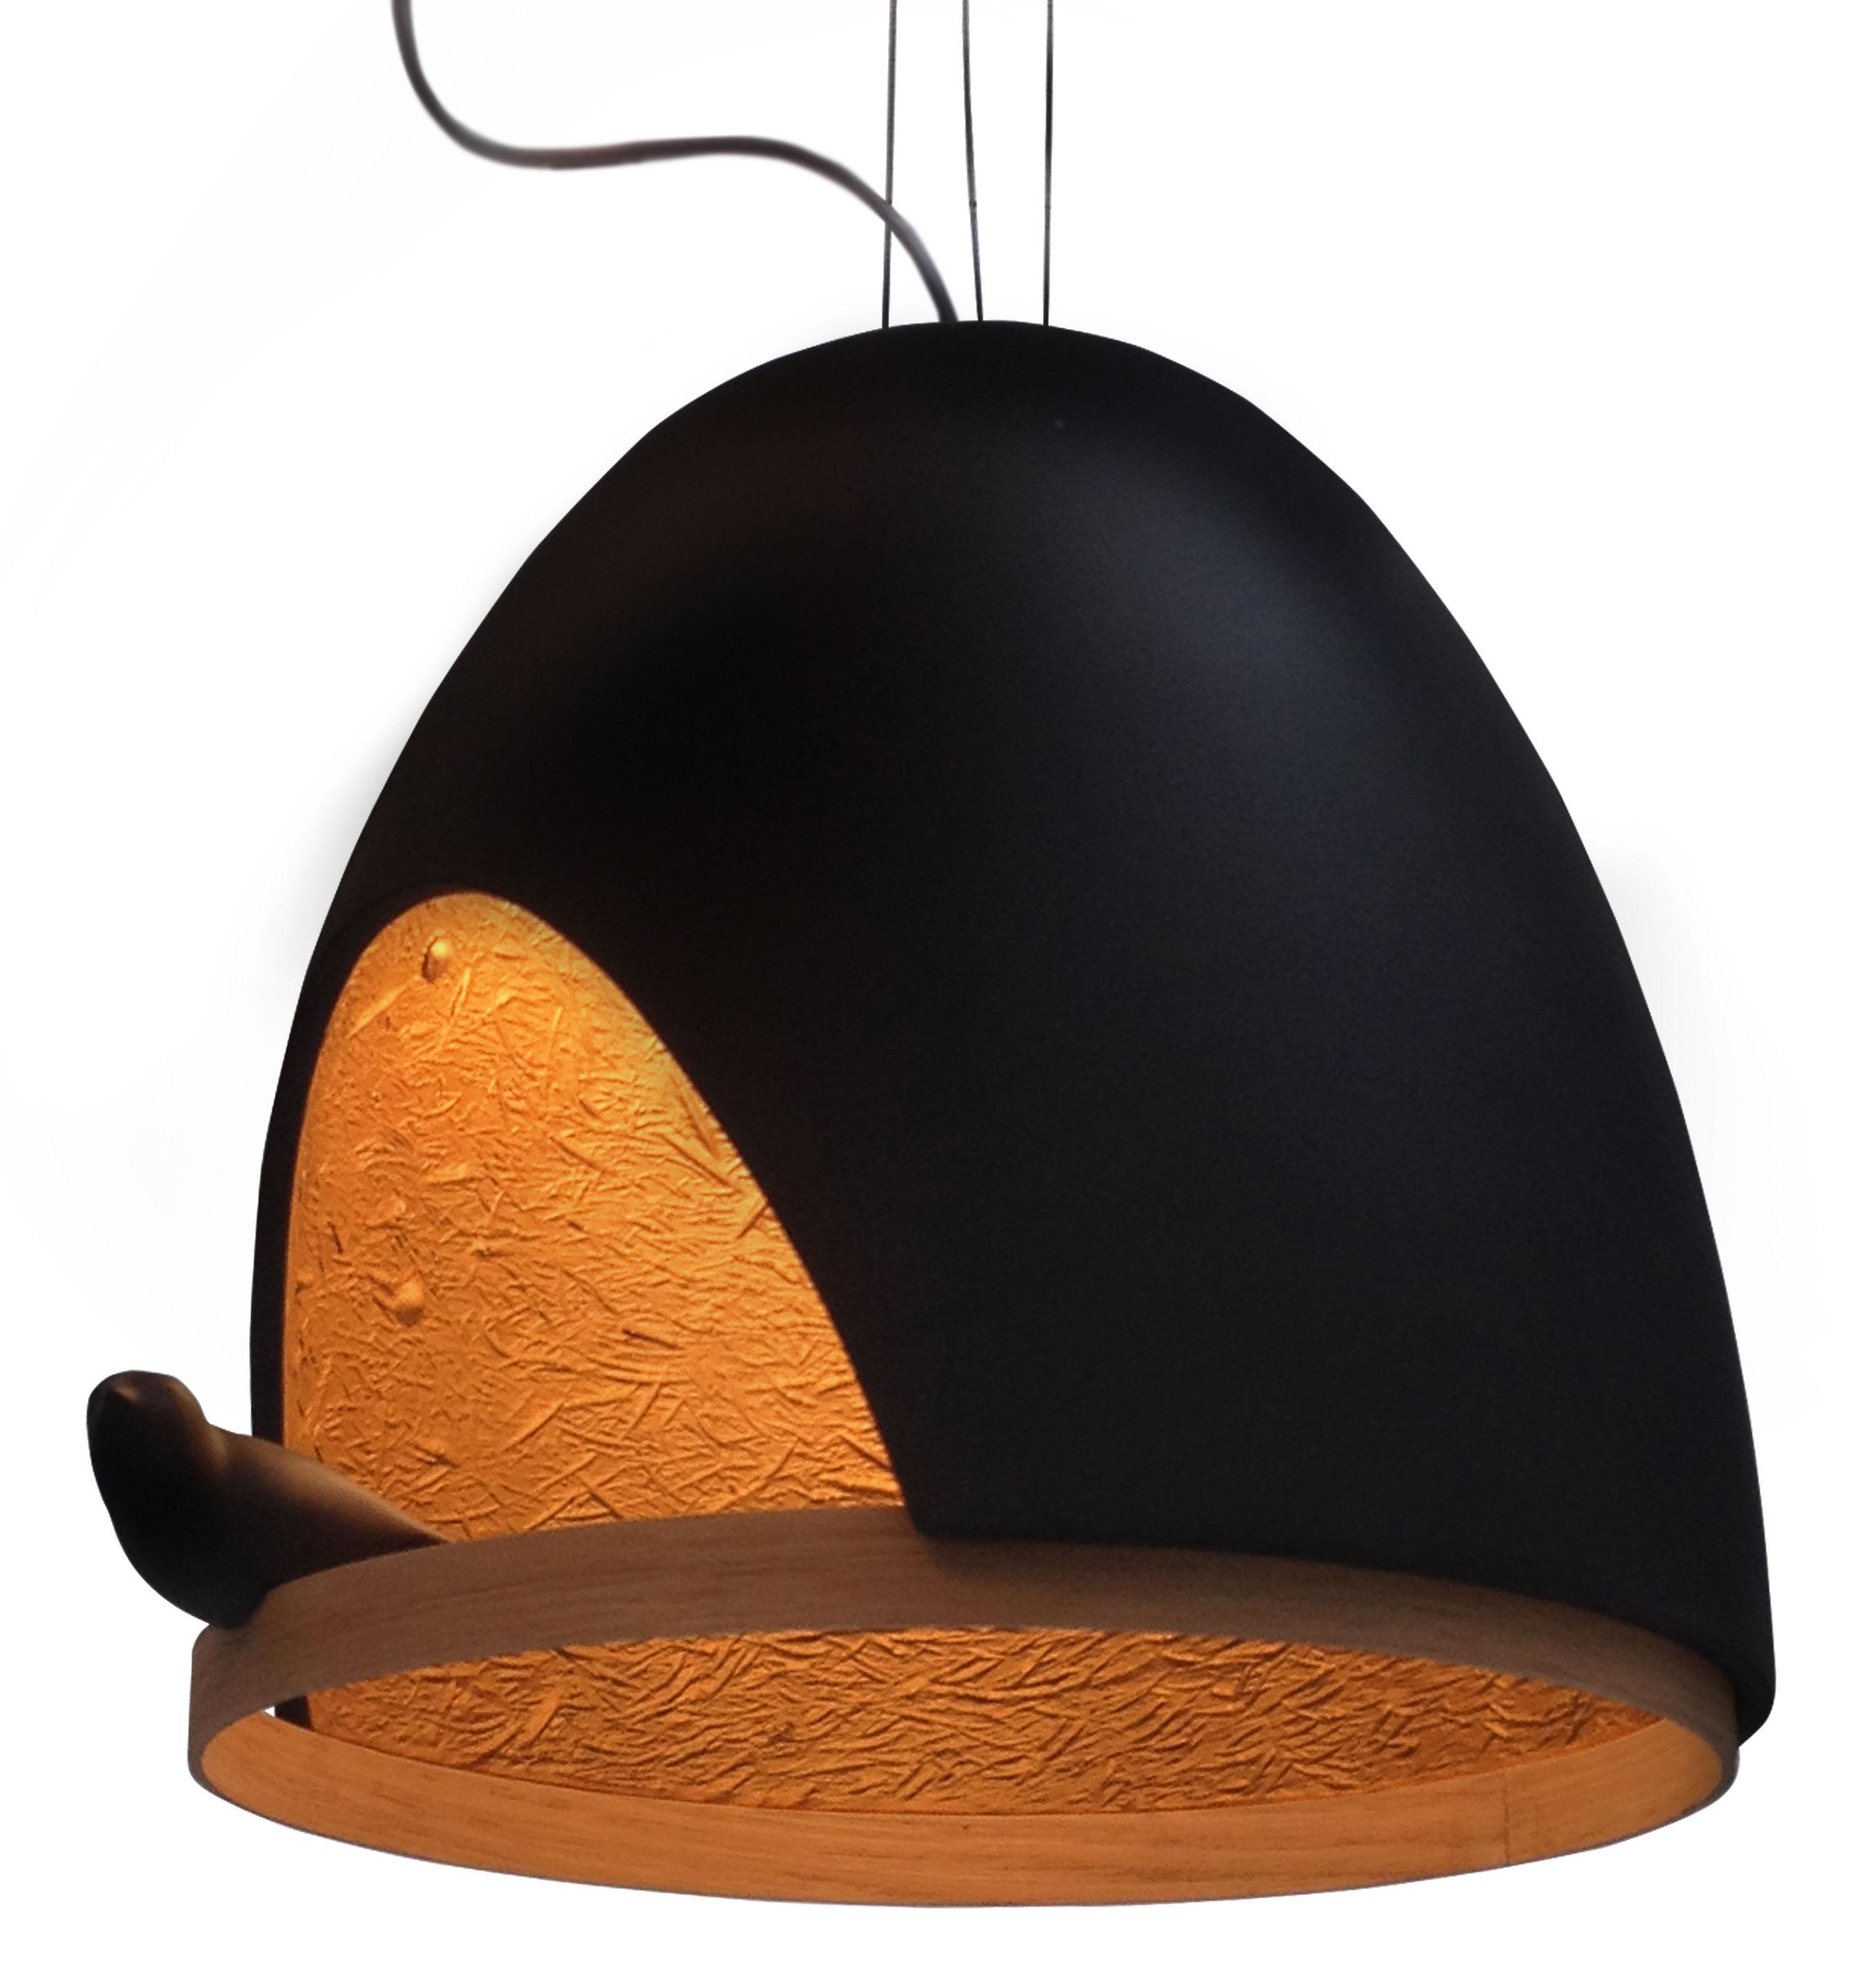 Lighting - Pendant Lighting - Oiseau Pendant by Compagnie - Black / Gold inside - Oak, Plaster